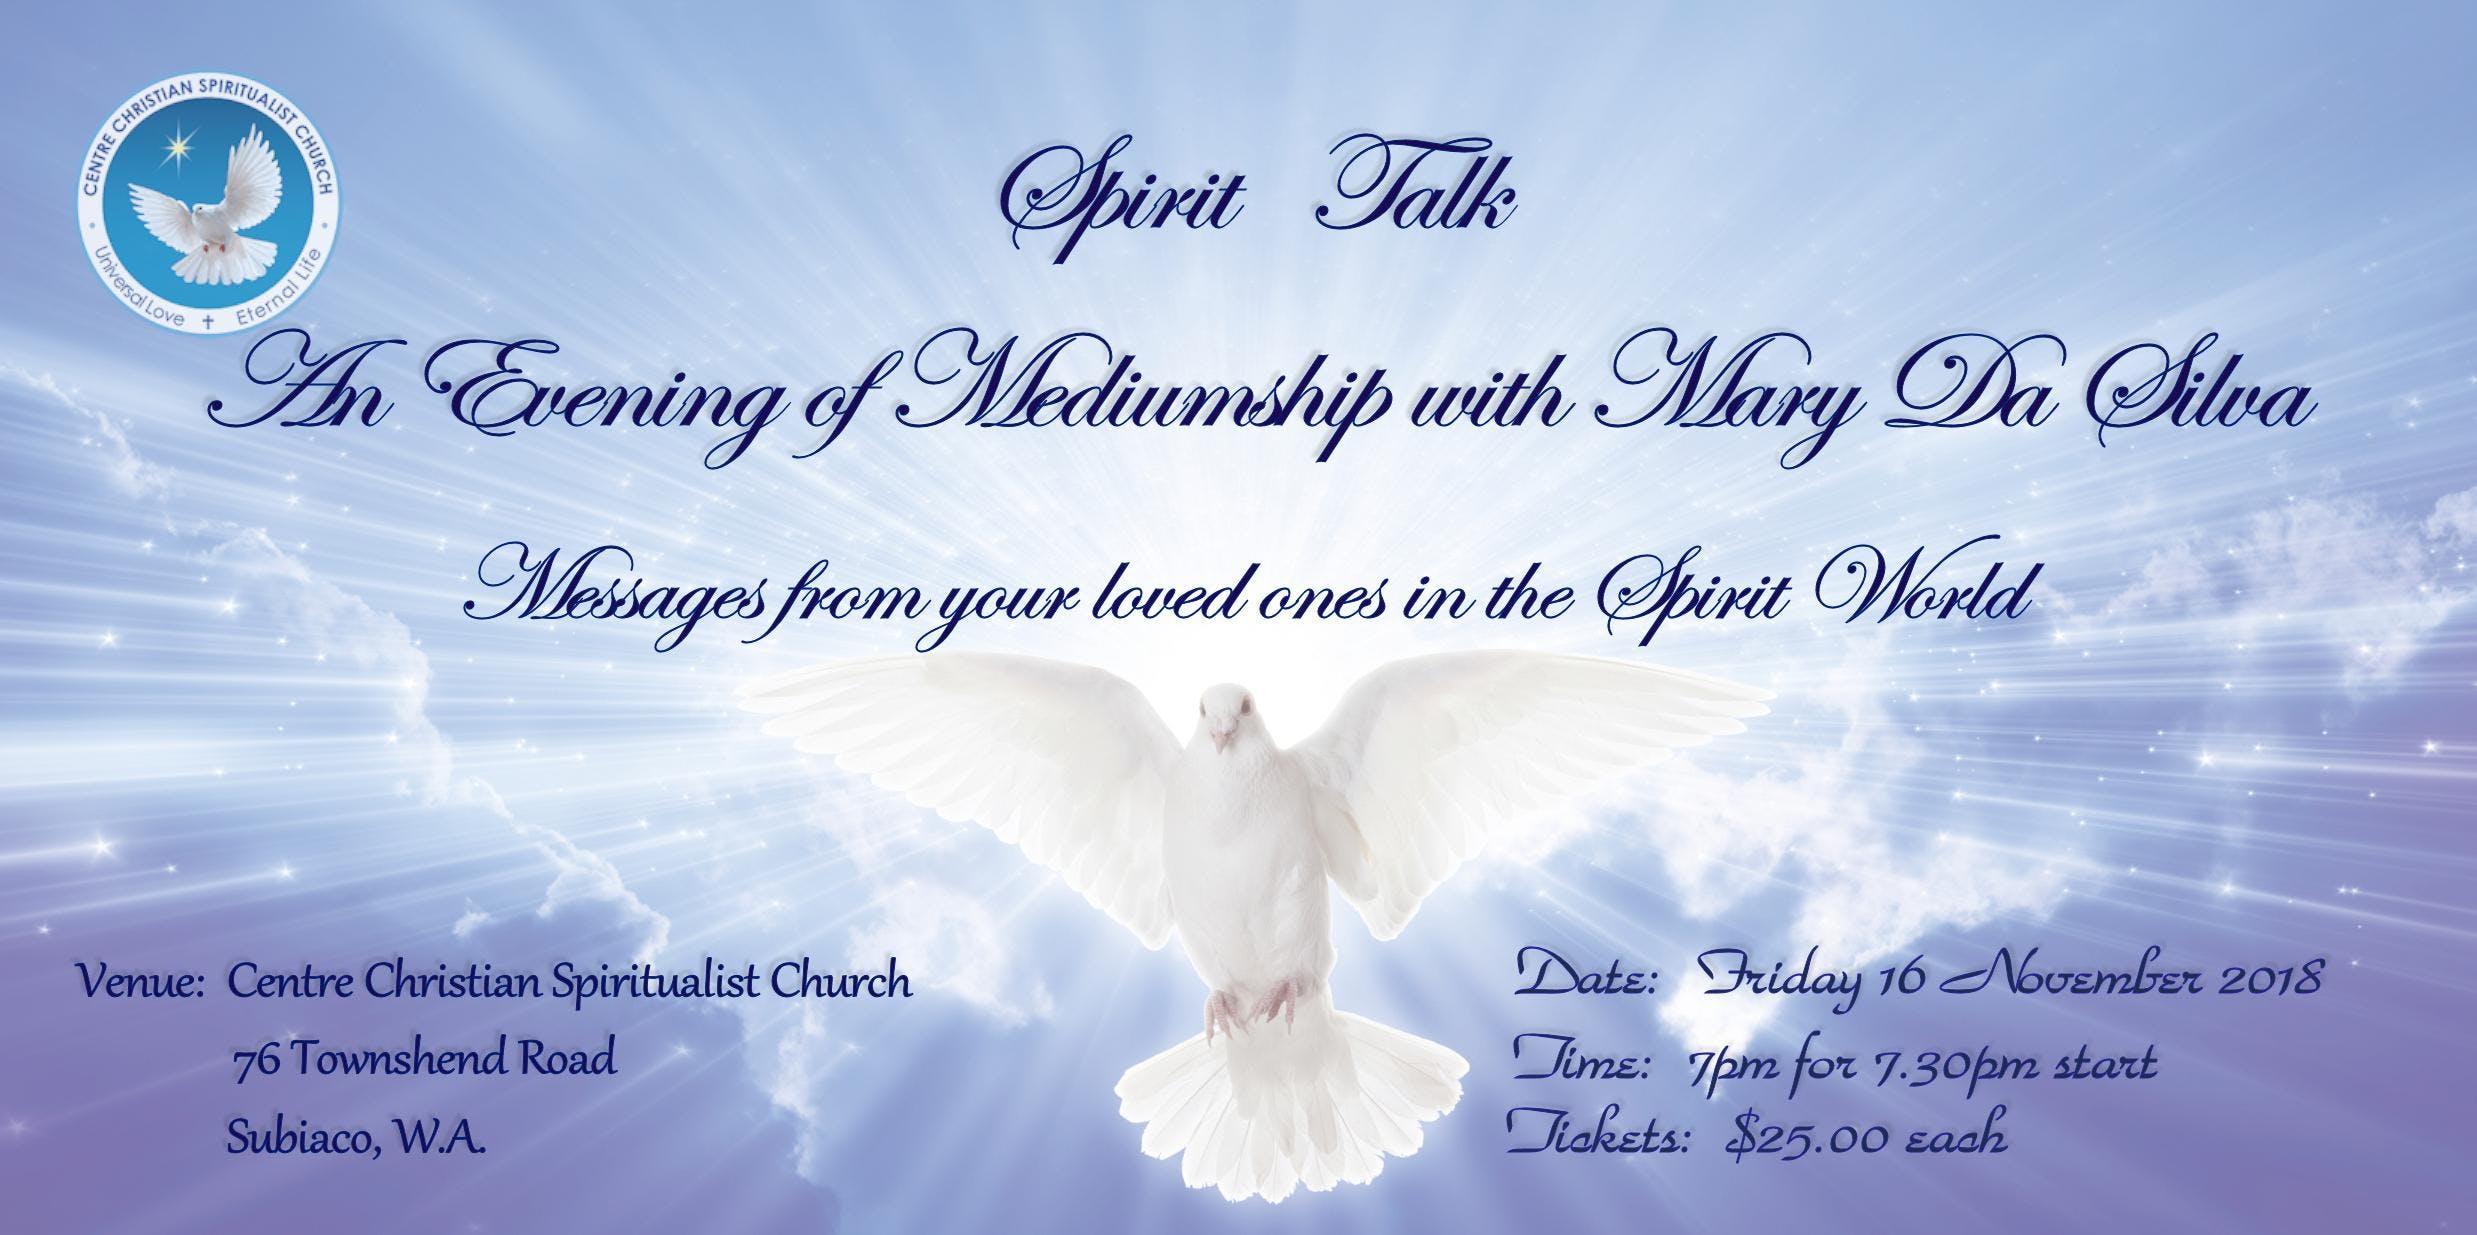 Spirit Talk, An Evening of Mediumship with Ma